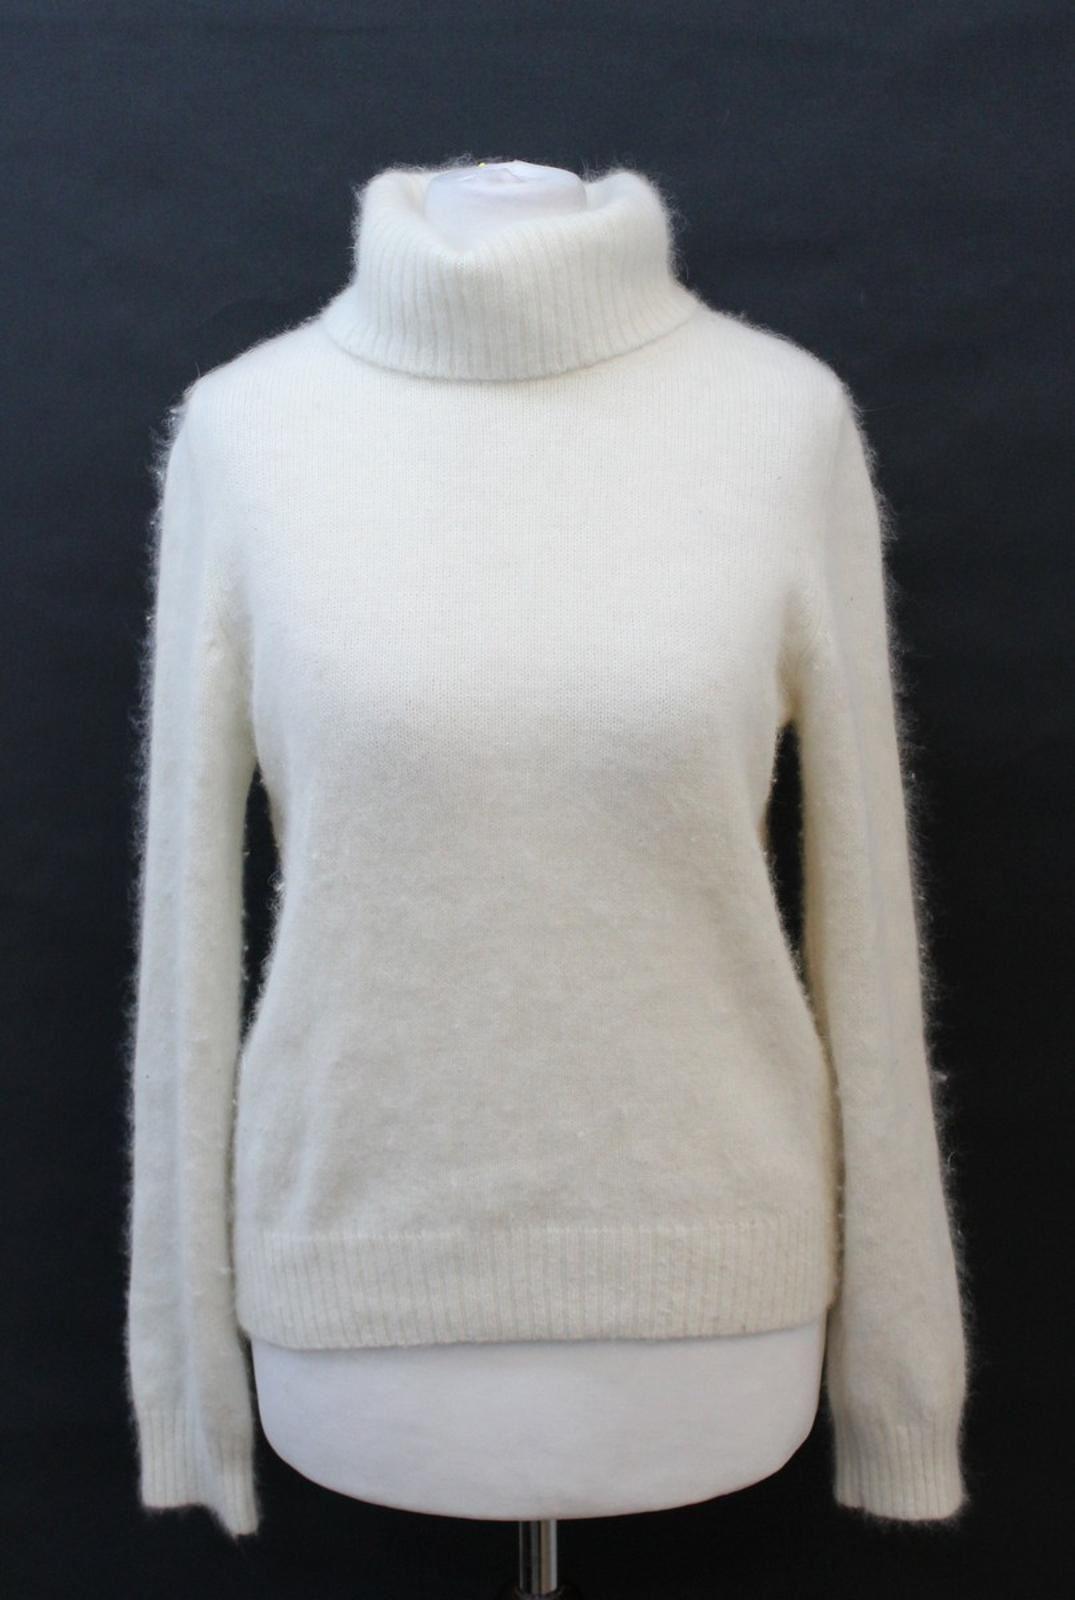 ST-MICHAEL-MARKS-amp-SPENCER-Ladies-Ivory-Wool-Blend-Knitwear-Jumper-UK8-EU36